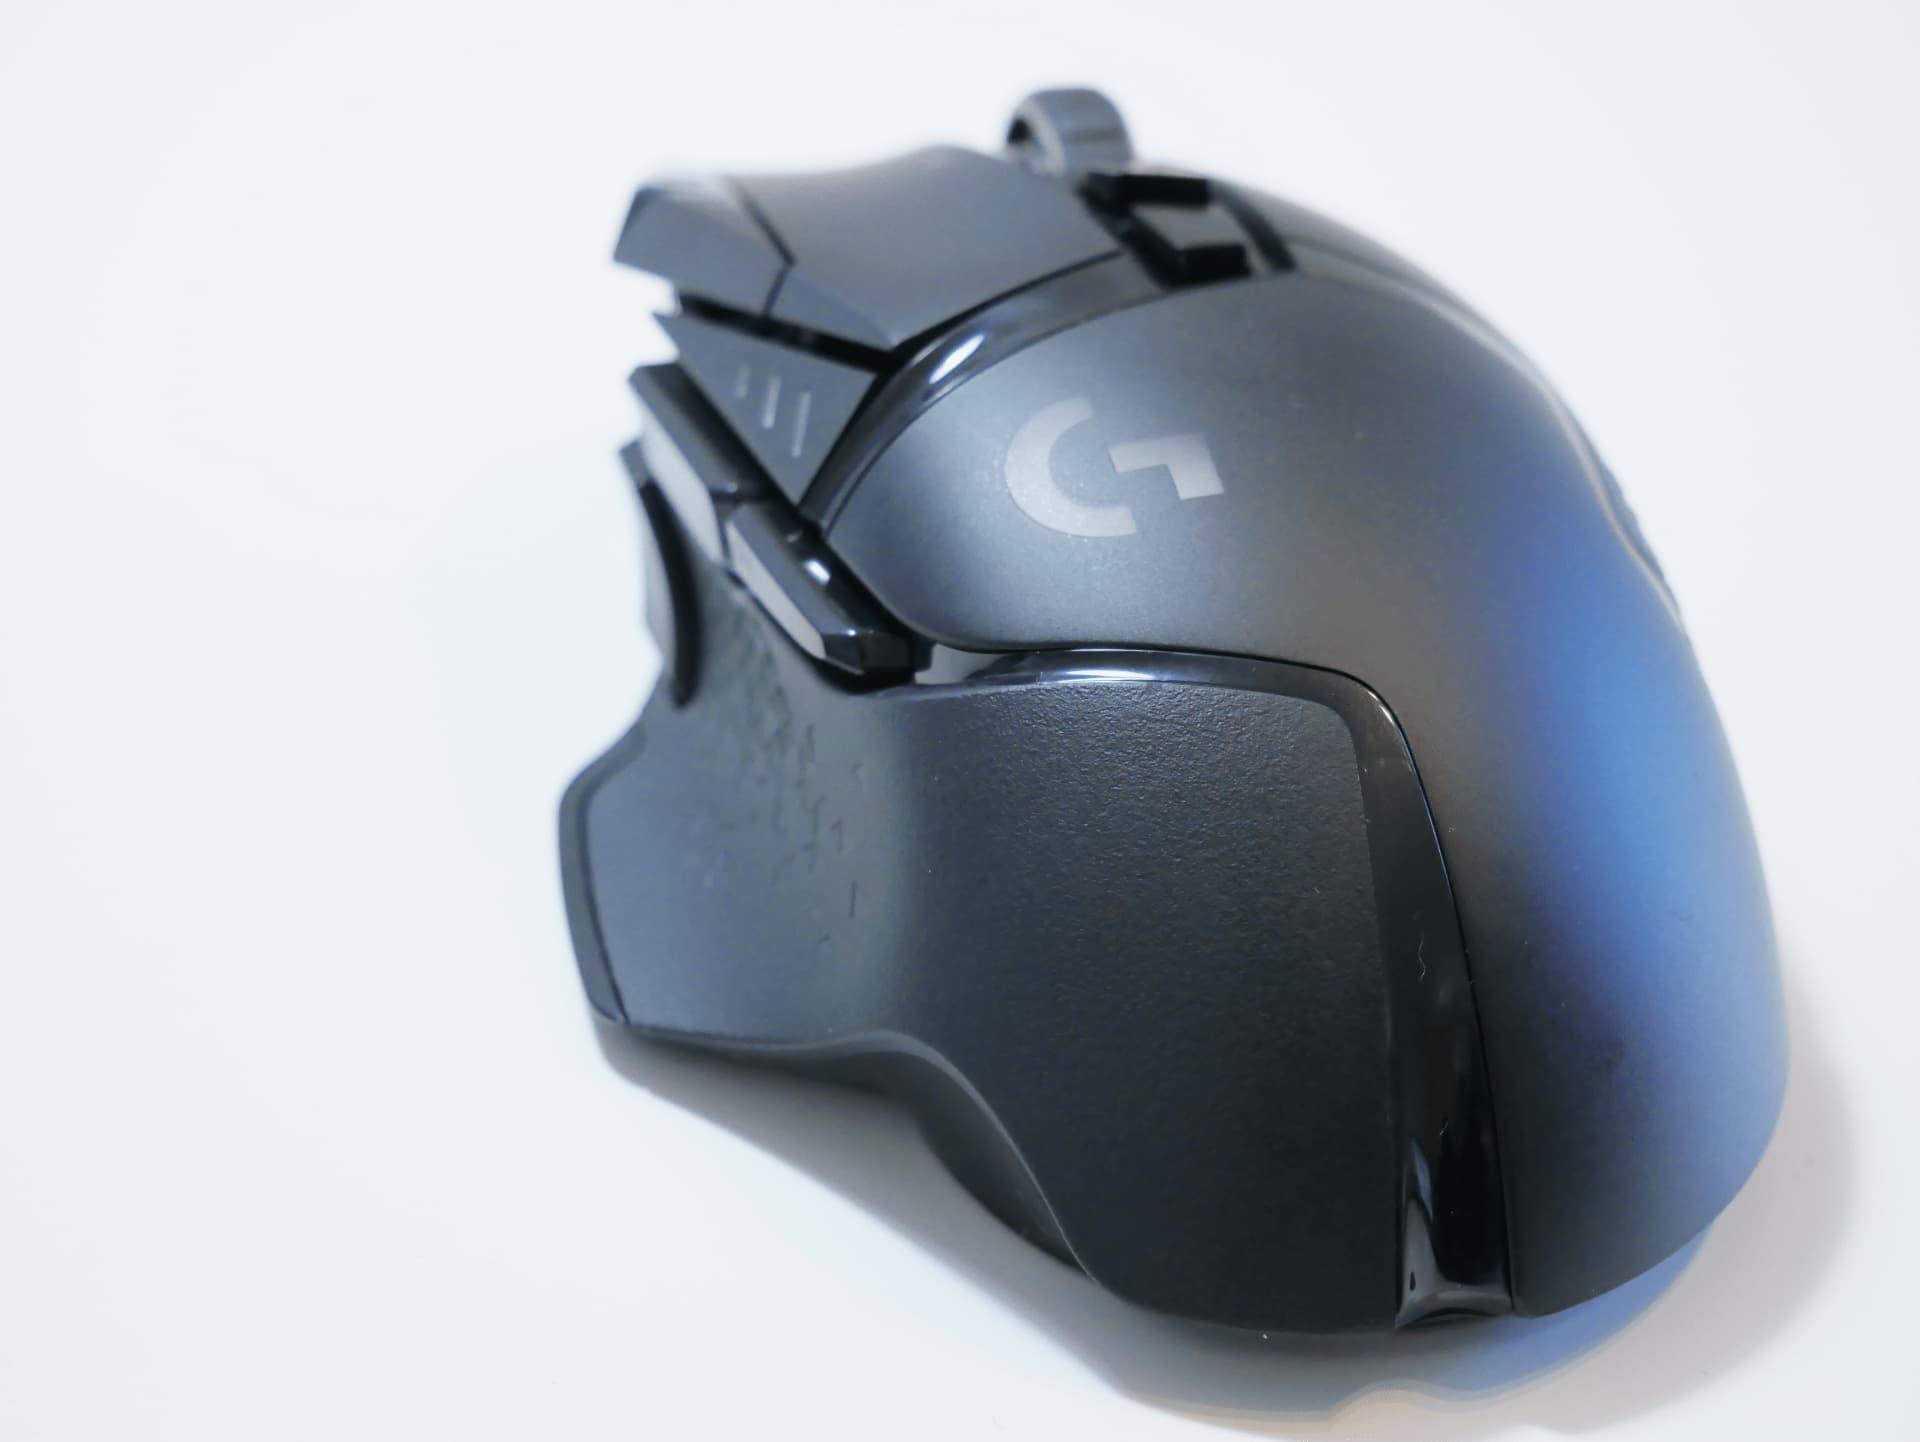 「Logicool G502WL」レビュー。ワイヤレス接続+多ボタン搭載に惹かれるならば要チェックの無線ゲーミングマウス